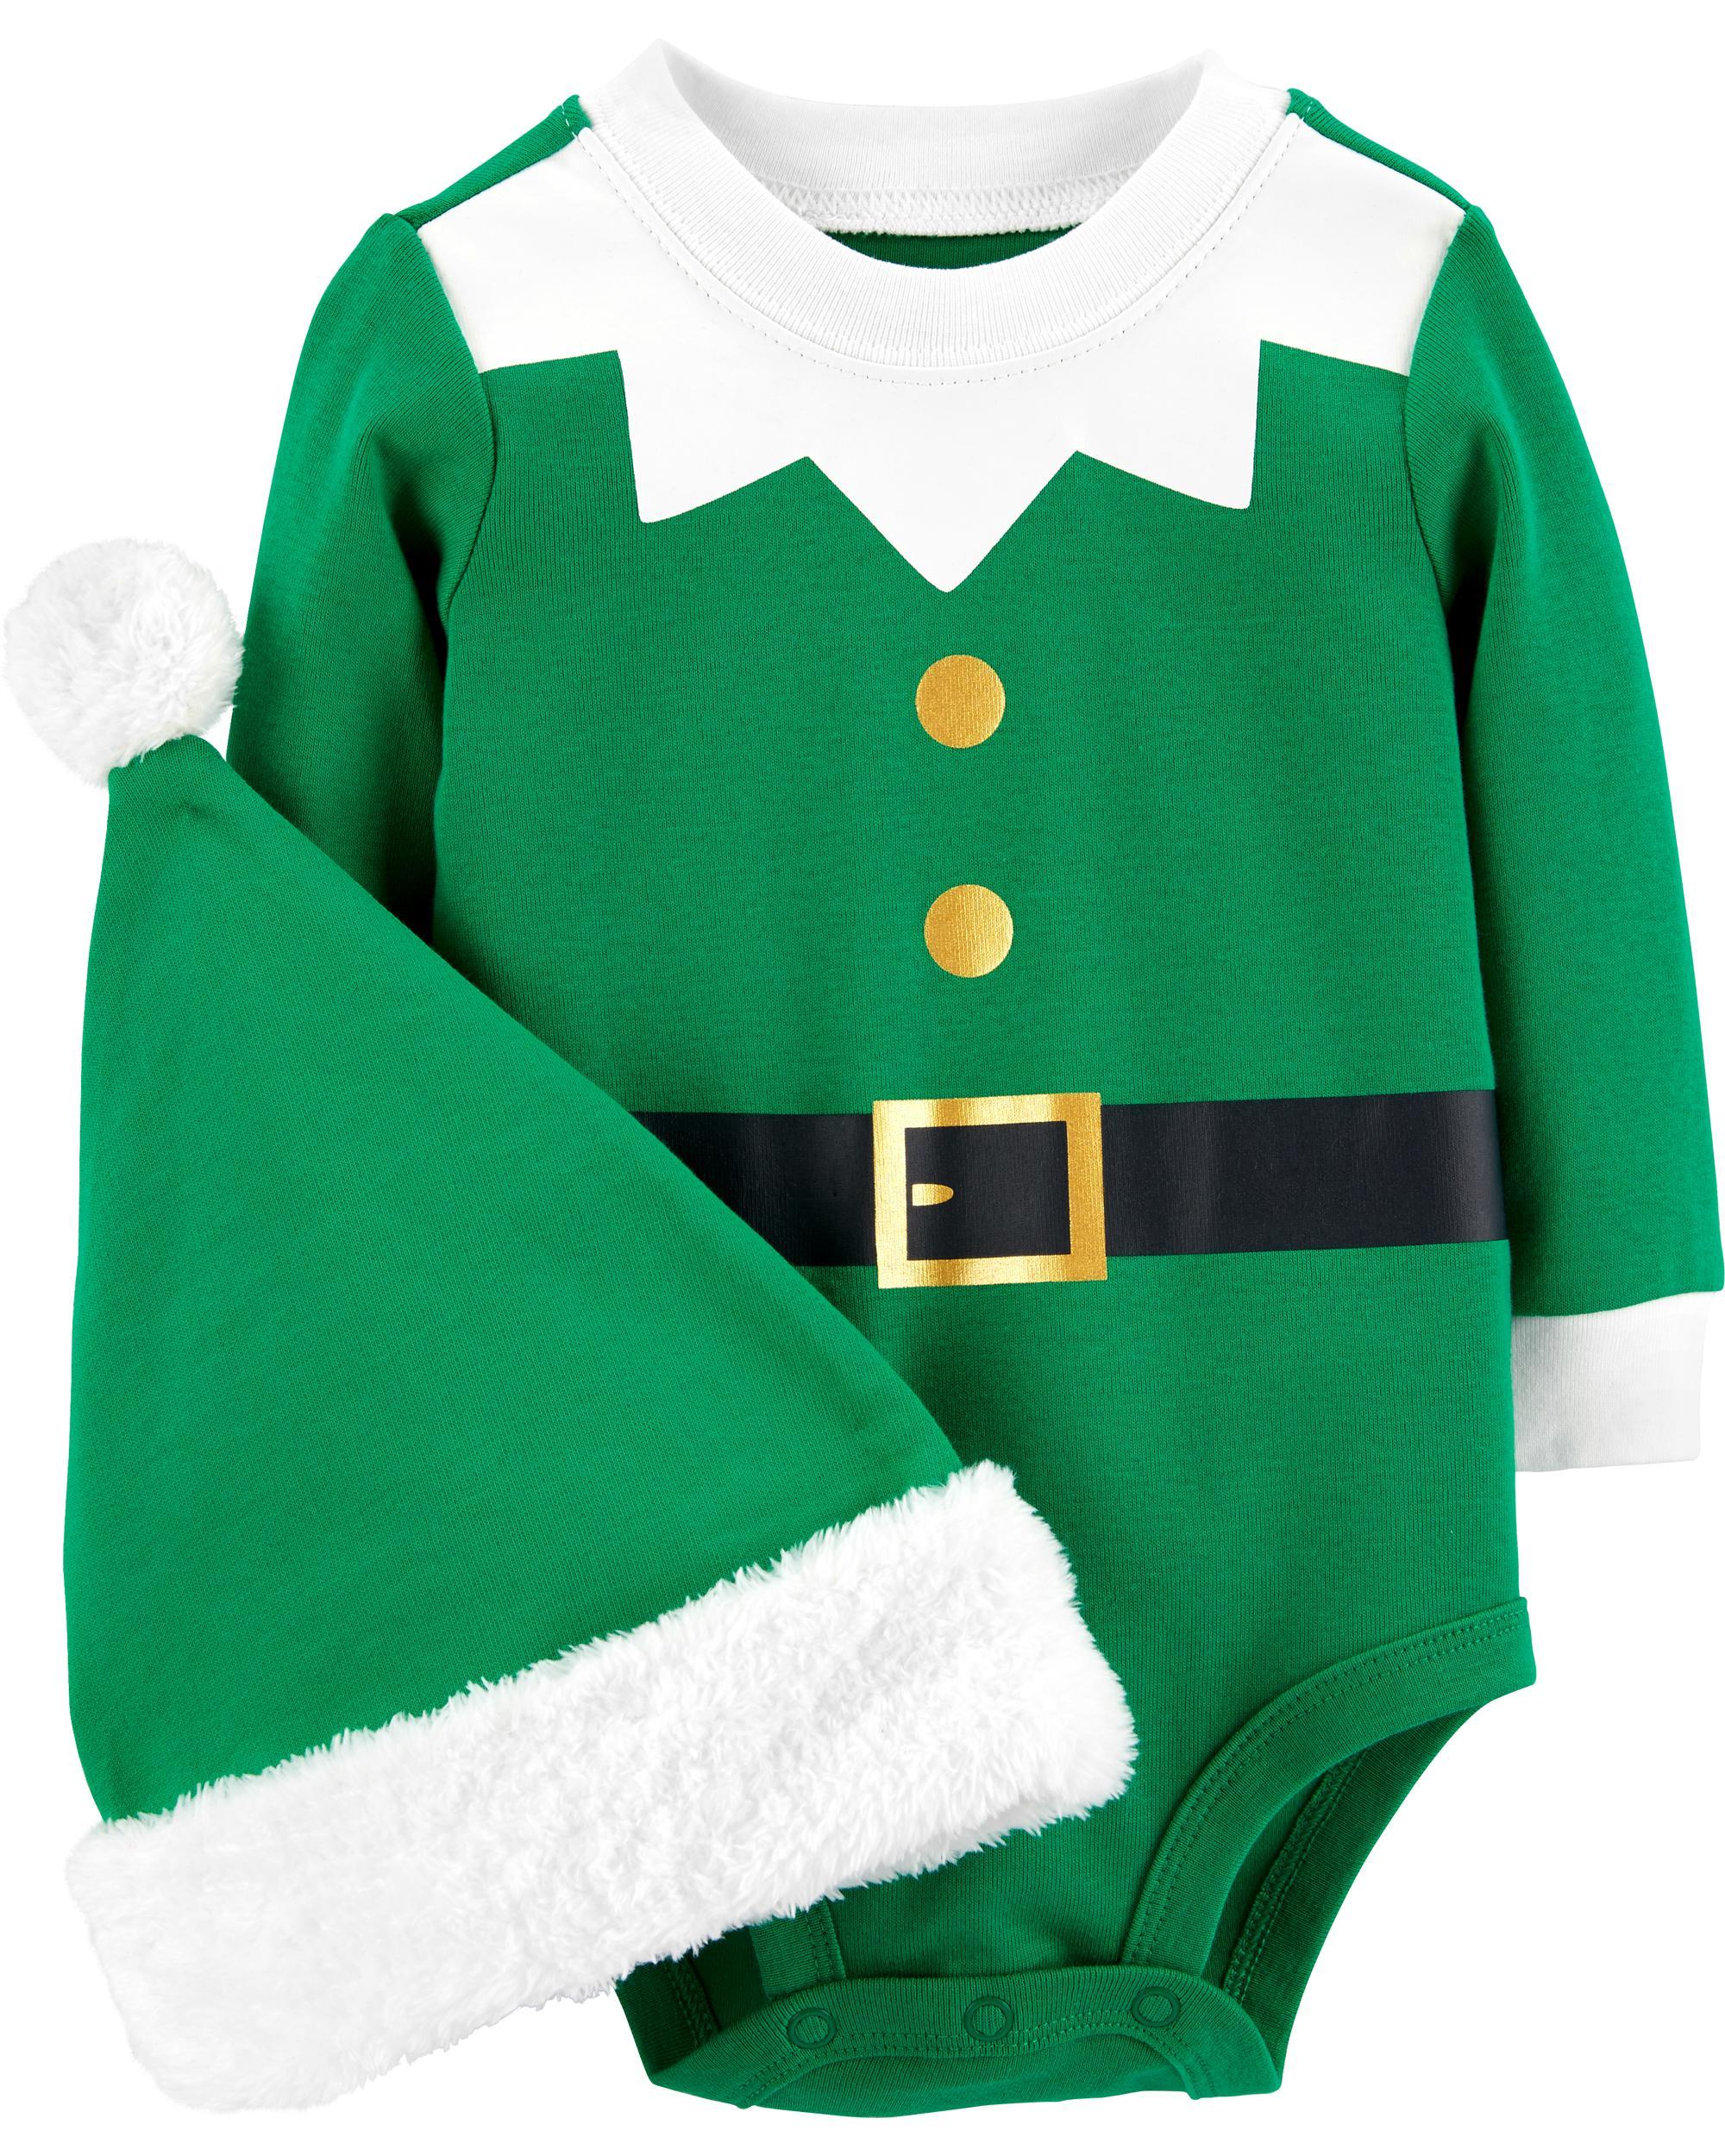 8dccf8fab25ec 2-Piece Elf Bodysuit & Hat Set | carters.com